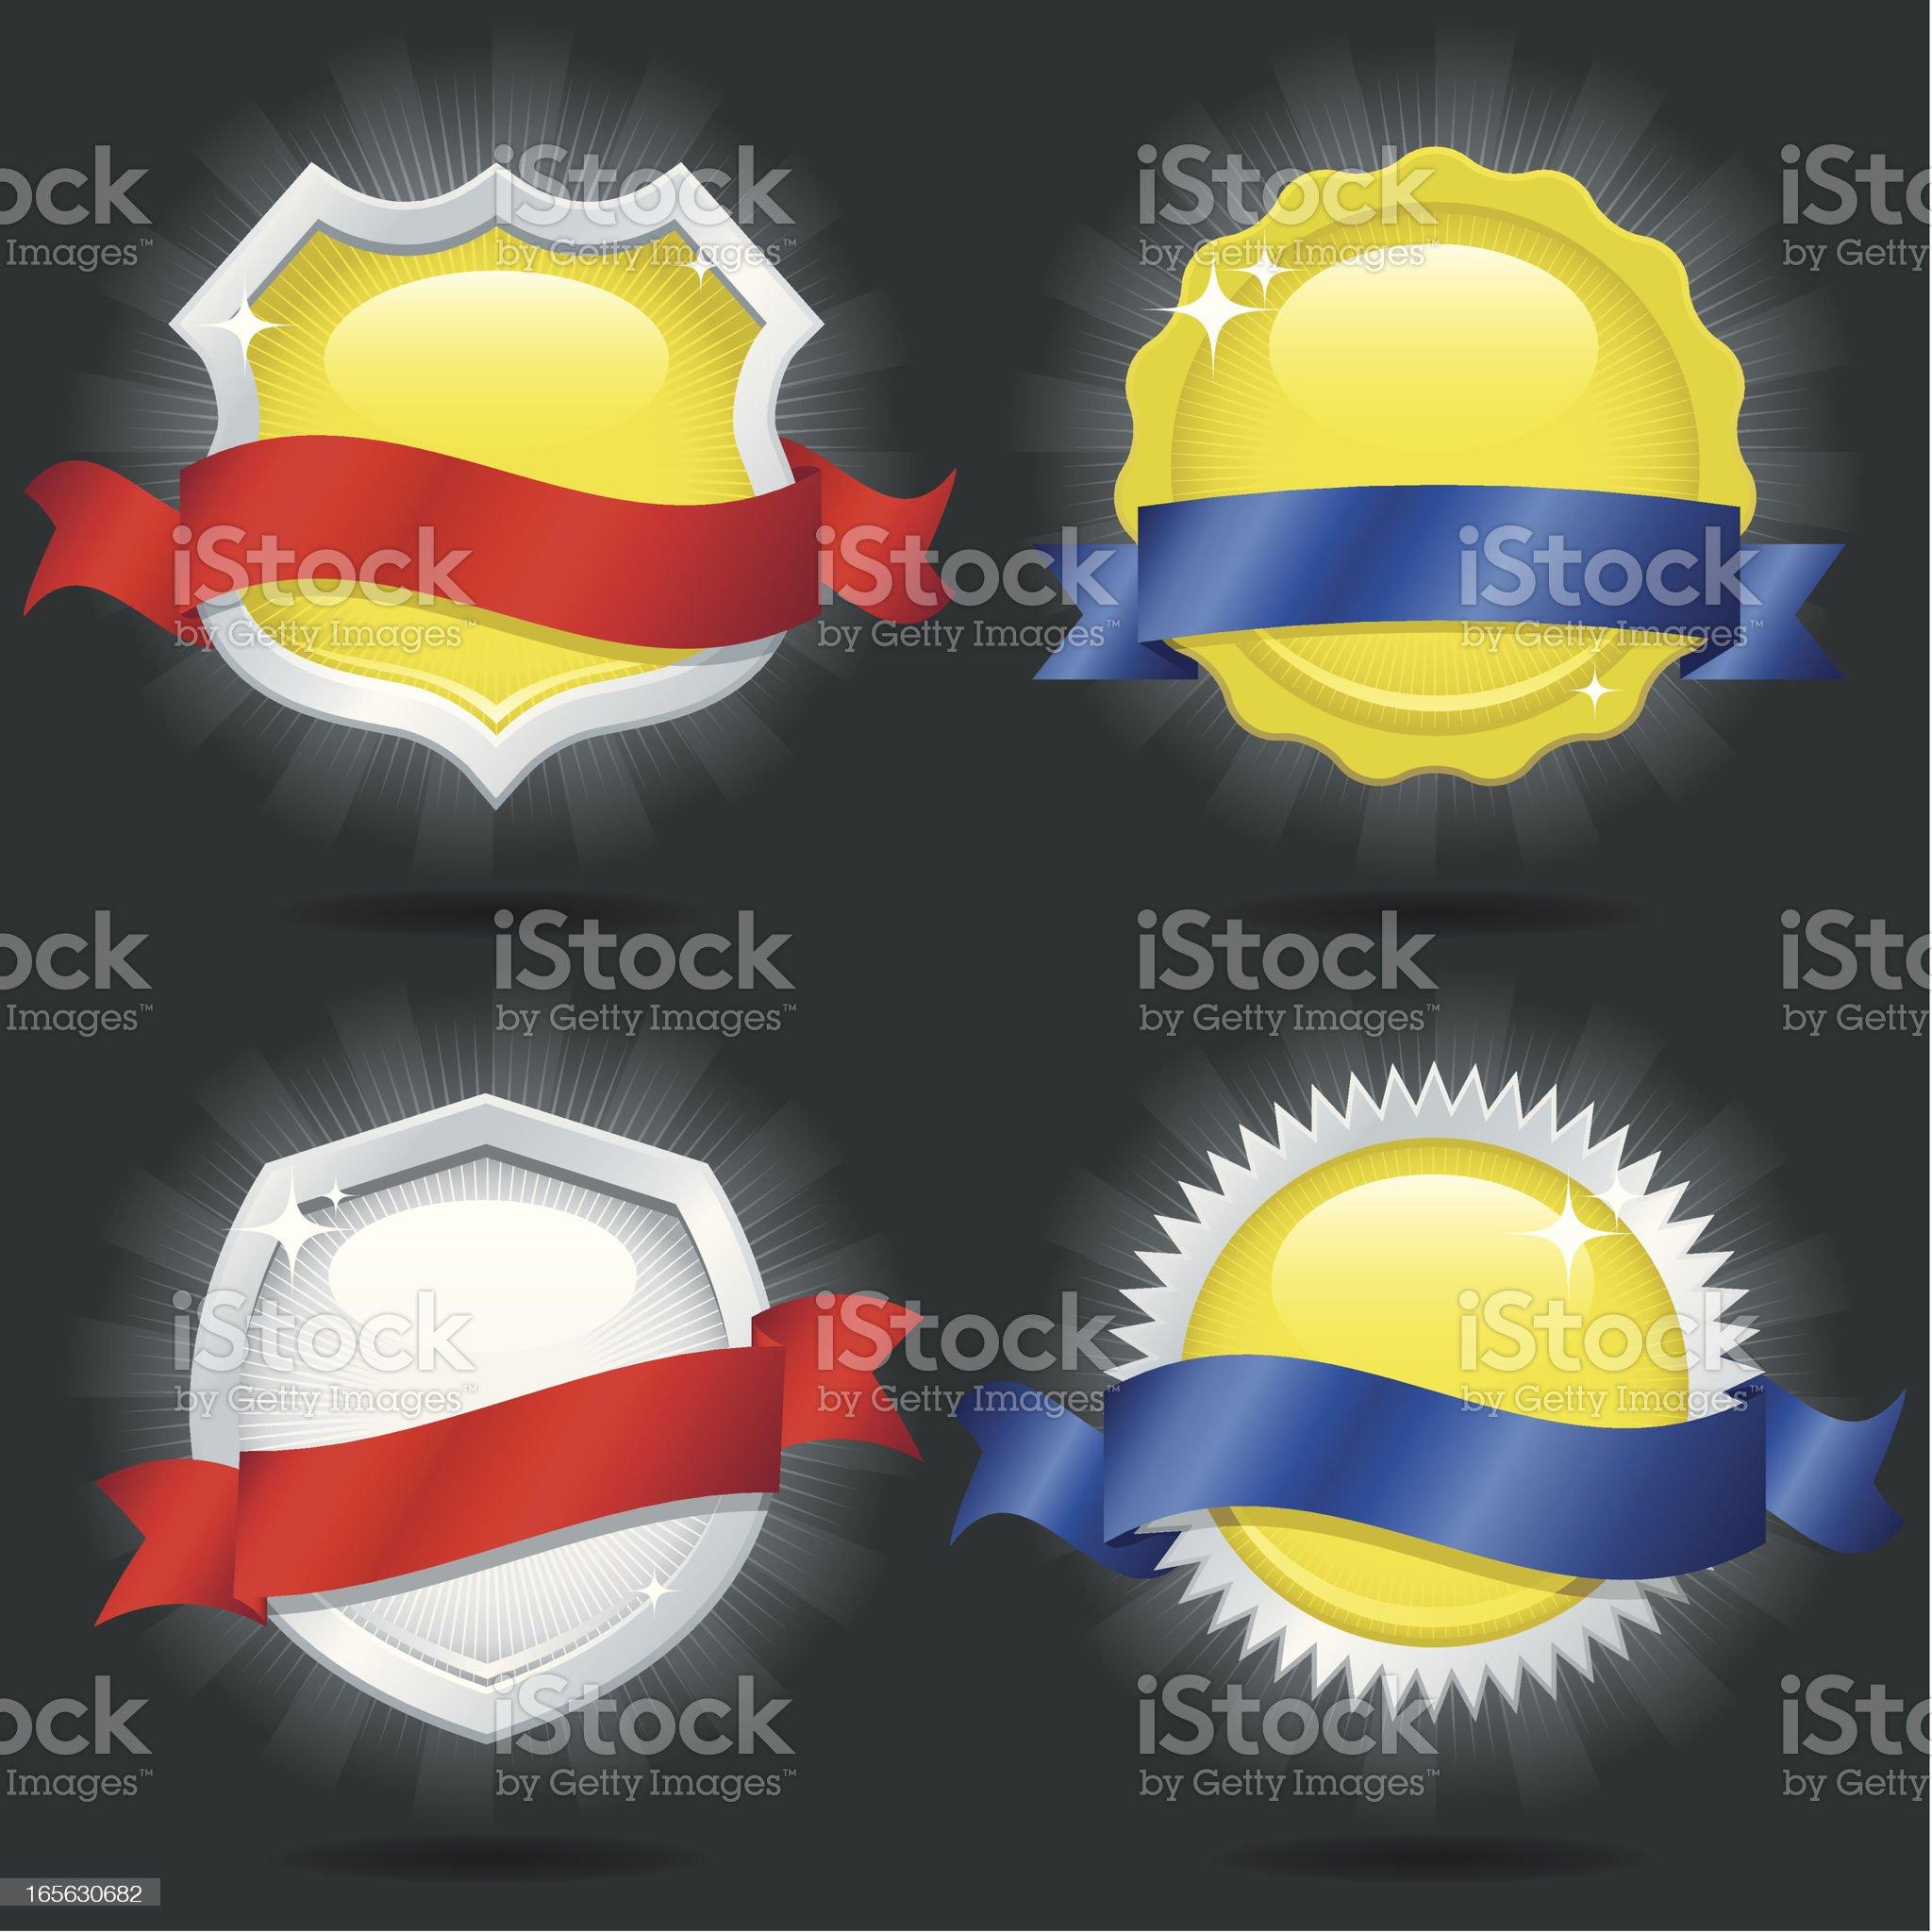 Metallic Emblems royalty-free stock vector art